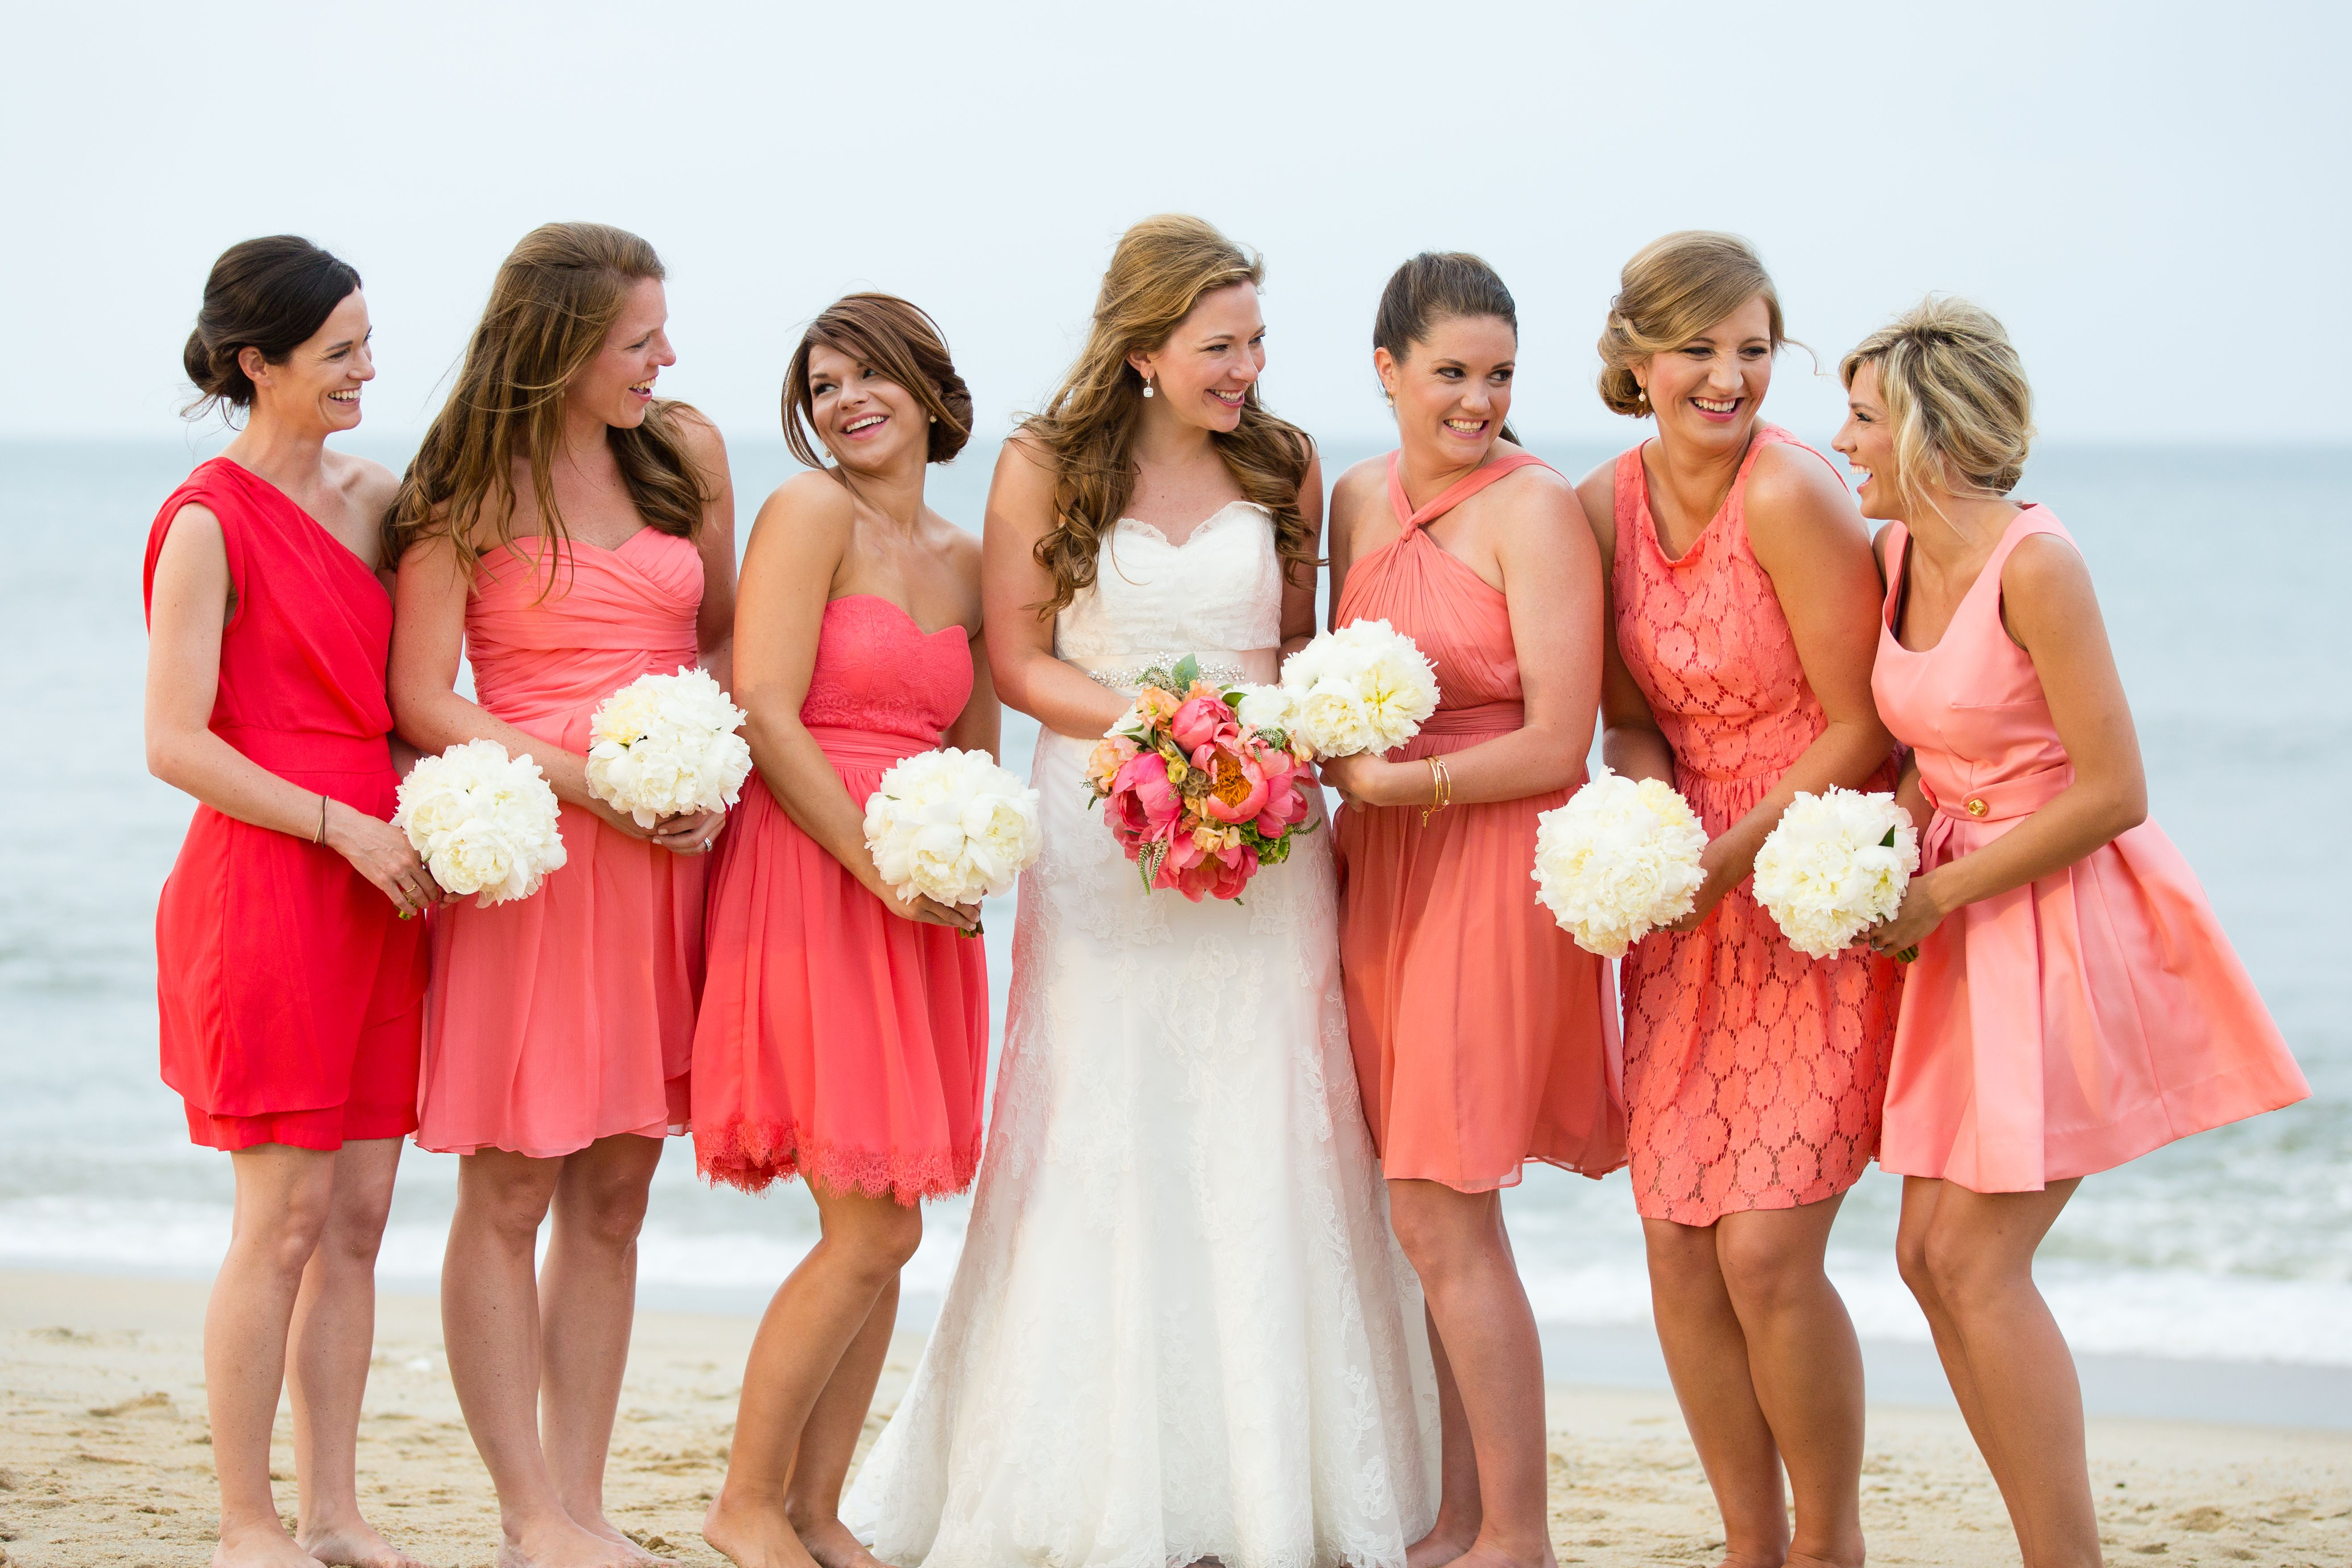 b01514c0e9 Wedding.Coral.Beach.Mismatched. Bridesmaid.Dresses = My vision coming true!